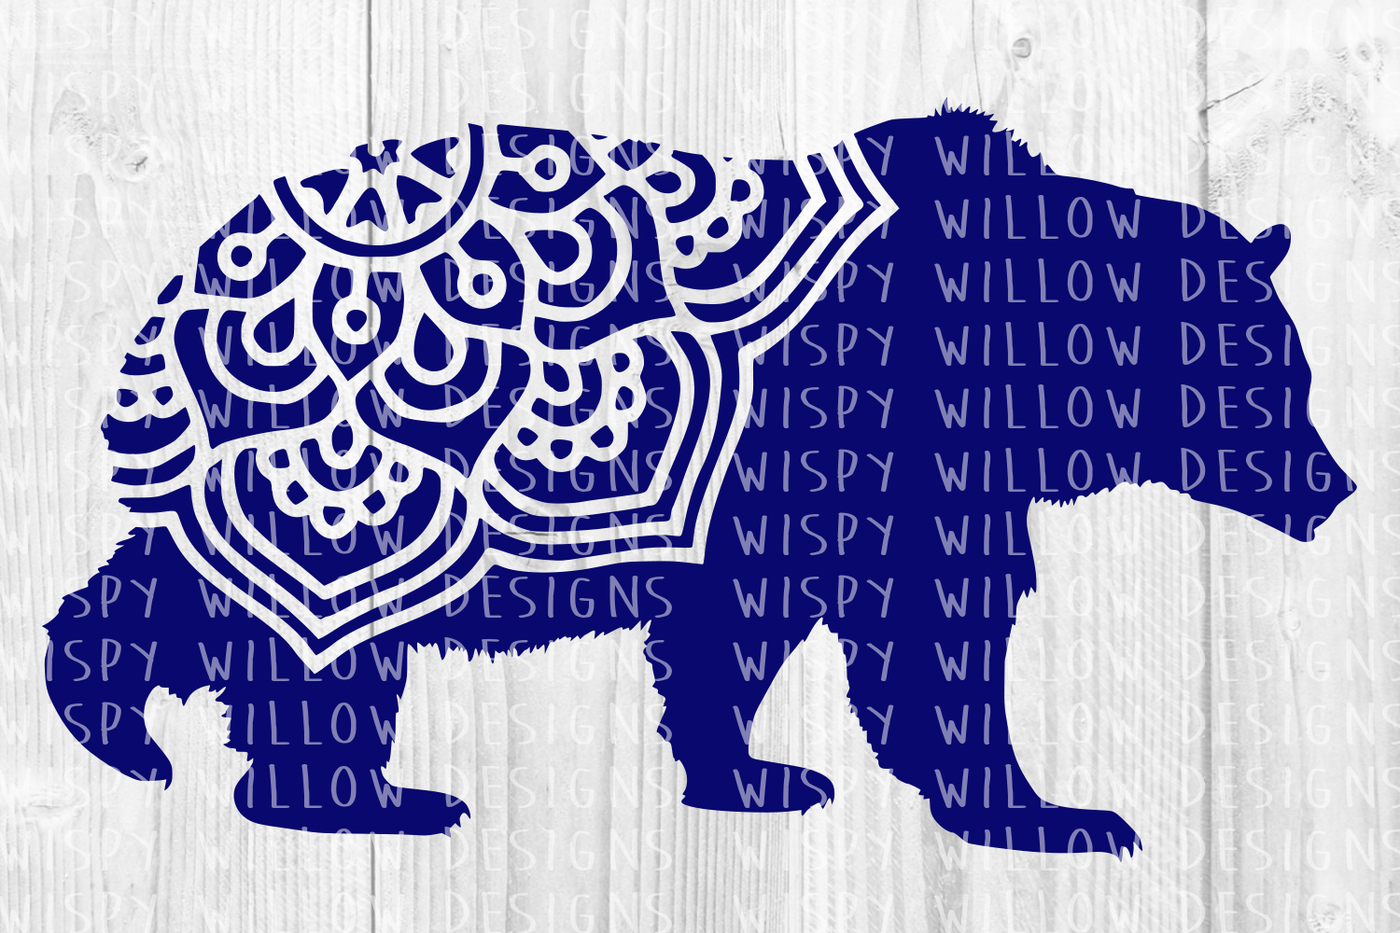 Bear Mandala Svg Dxf Eps Png Jpg Pdf By Wispy Willow Designs